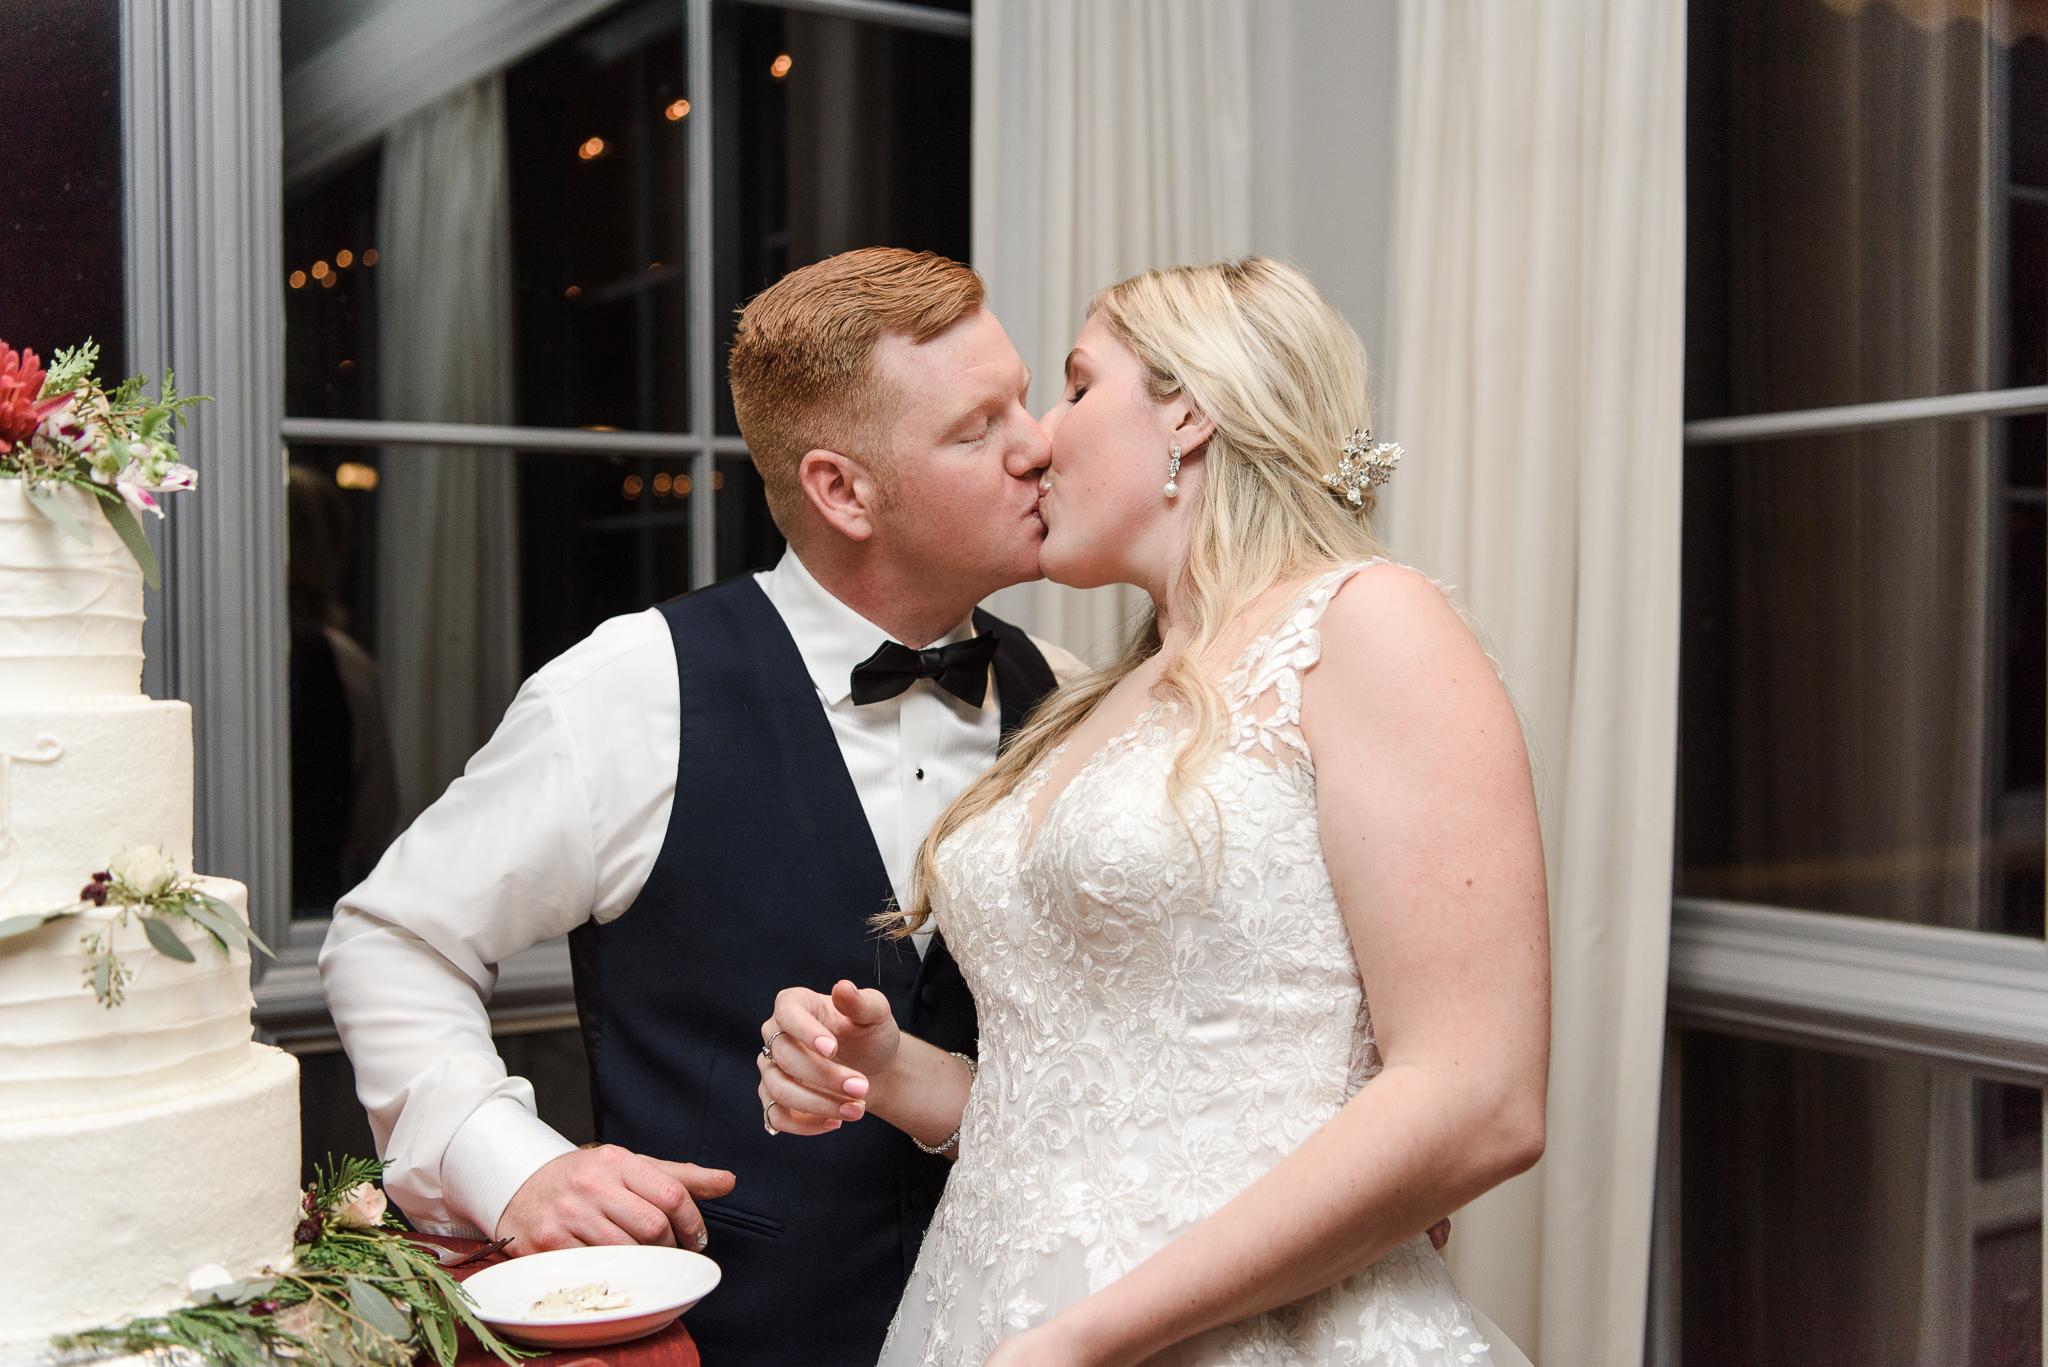 11_17_2018_Dana_Slifer_Photography_Julie_and_Ben_Wedding_WEB_965.jpg